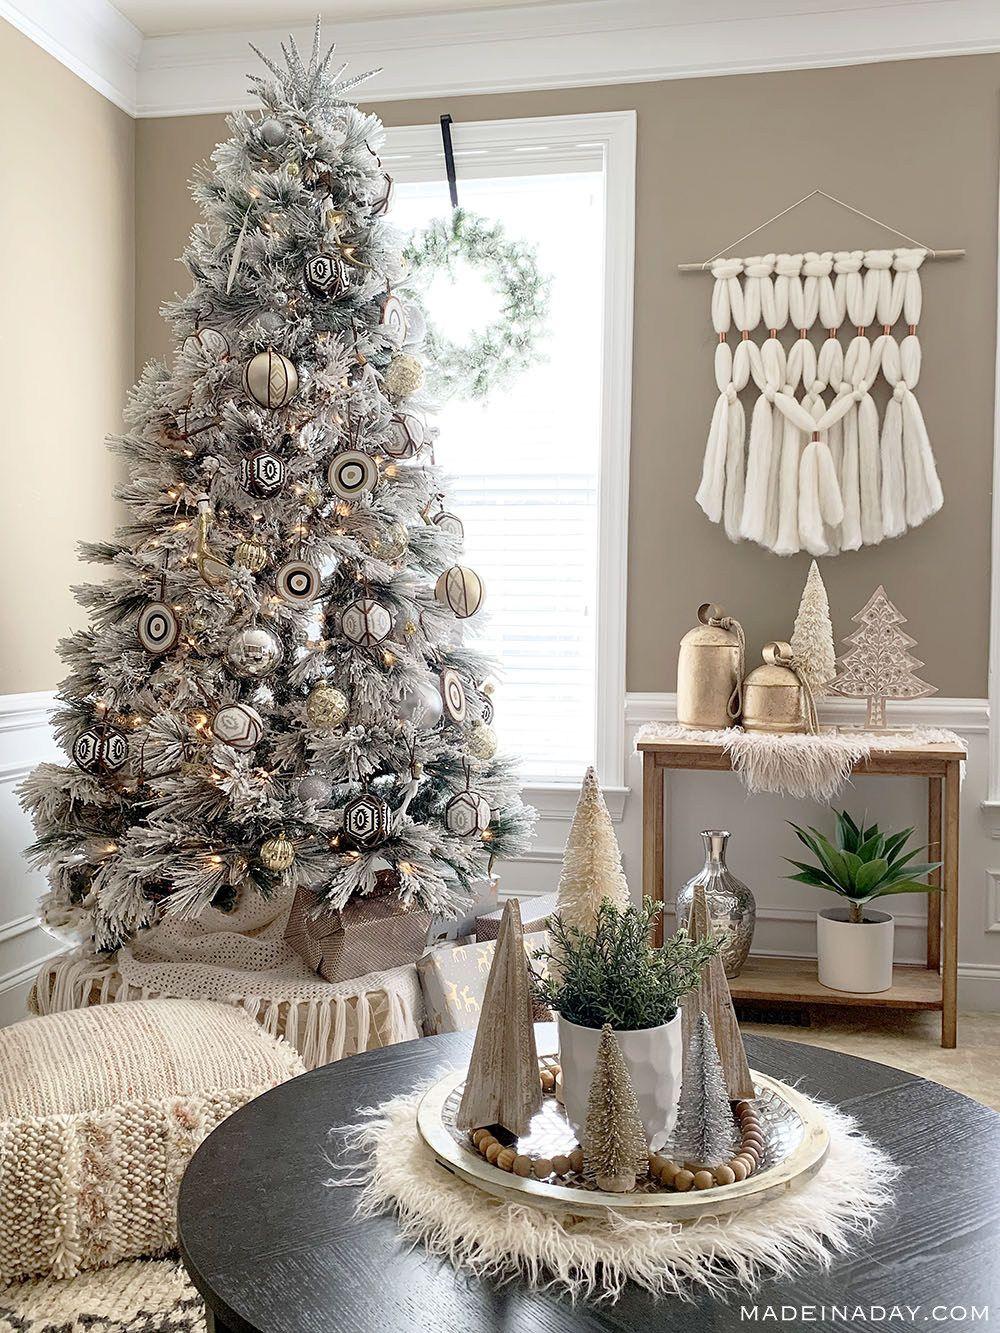 Christmas Tree Ornaments Primitive Ornament Holiday Decorations. Modern Farmhouse Boho Holiday Farmhouse Christmas Christmas Ornament